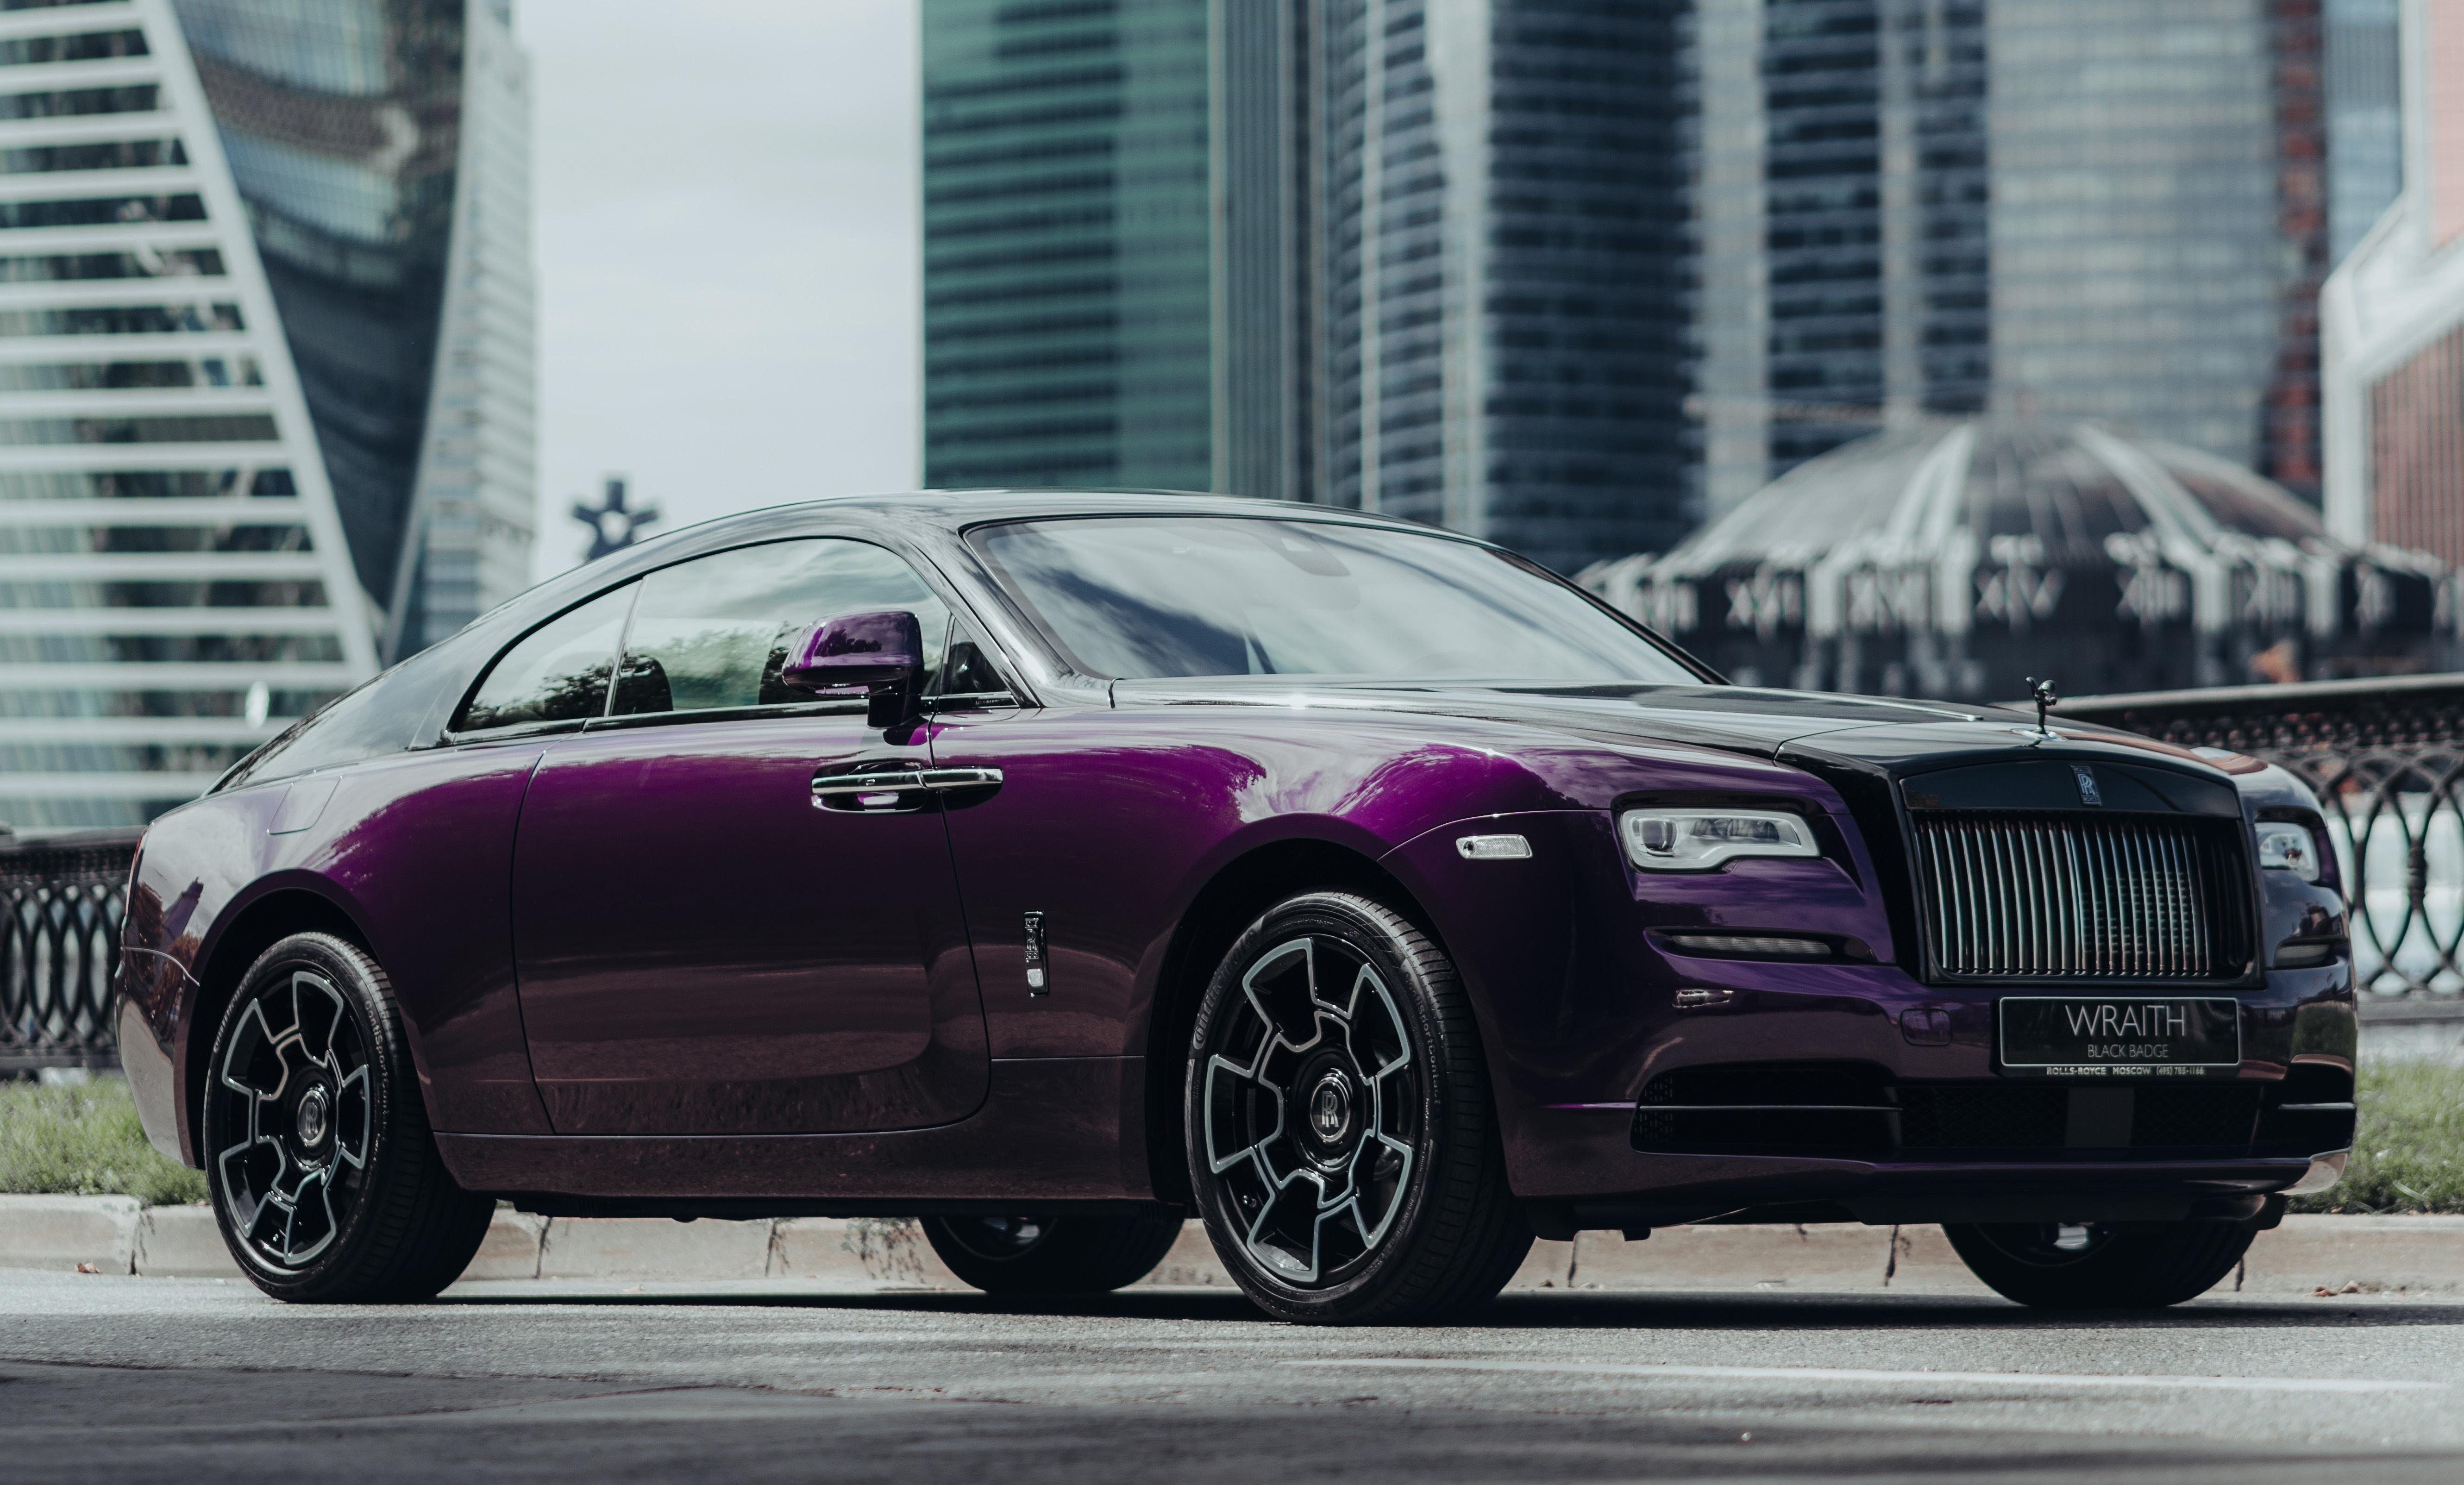 Ngam bo suu tap Rolls-Royce dac biet 'Dem Moscow' hinh anh 22